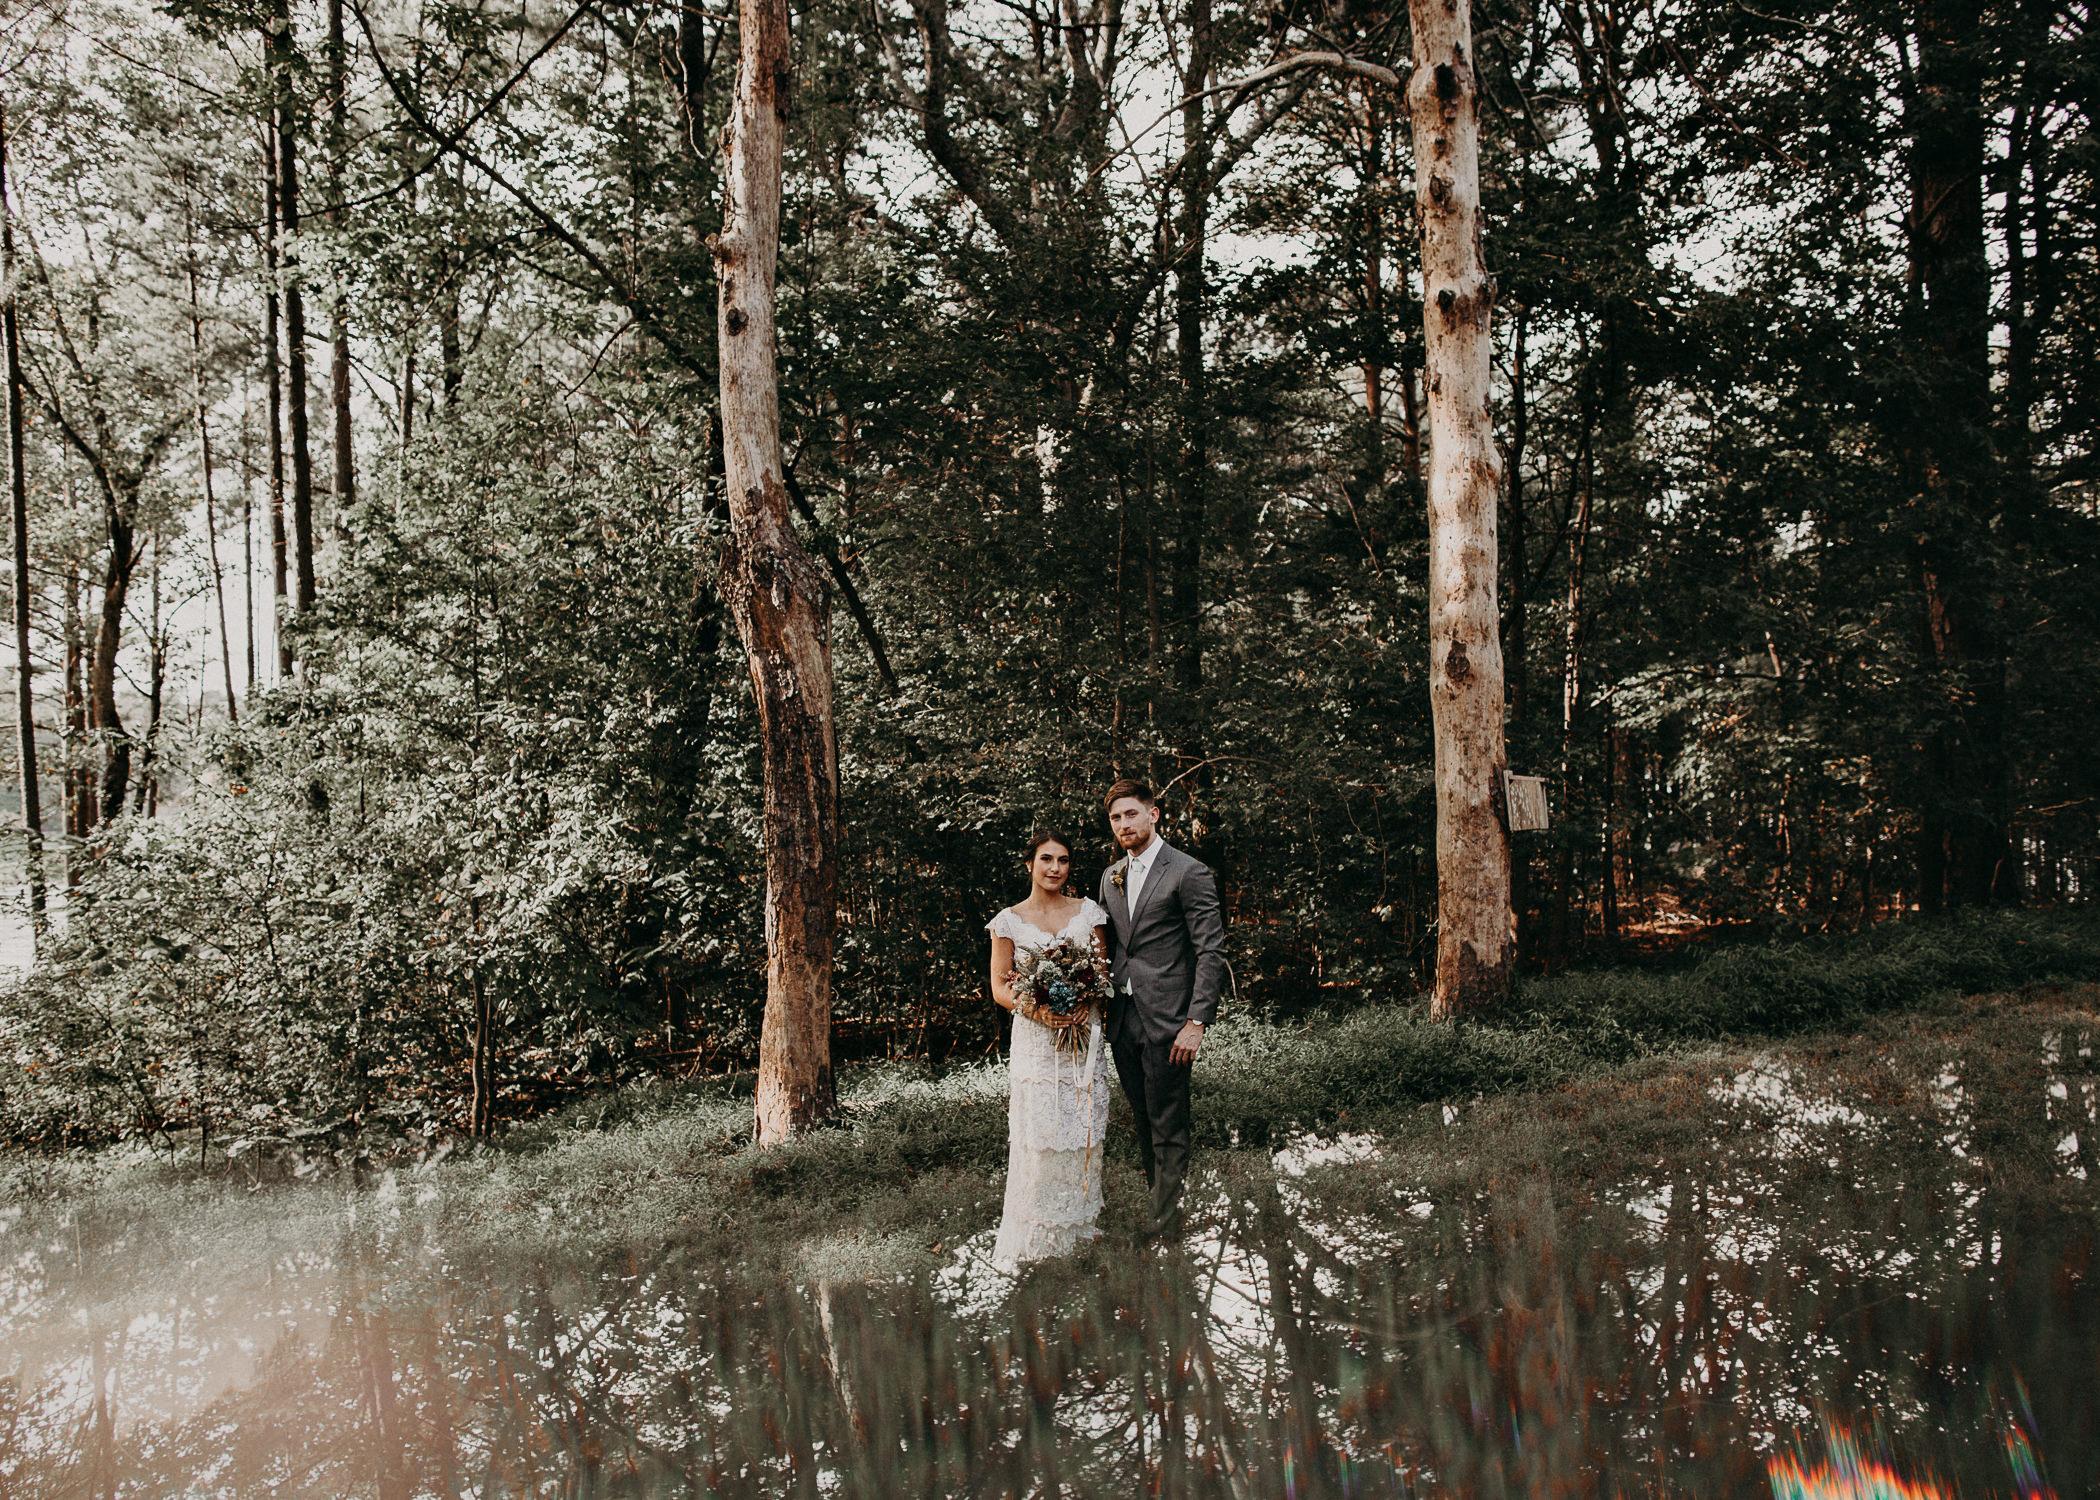 44 Bride & Groom first look before the ceremony on wedding day - Atlanta Wedding Photographer .jpg